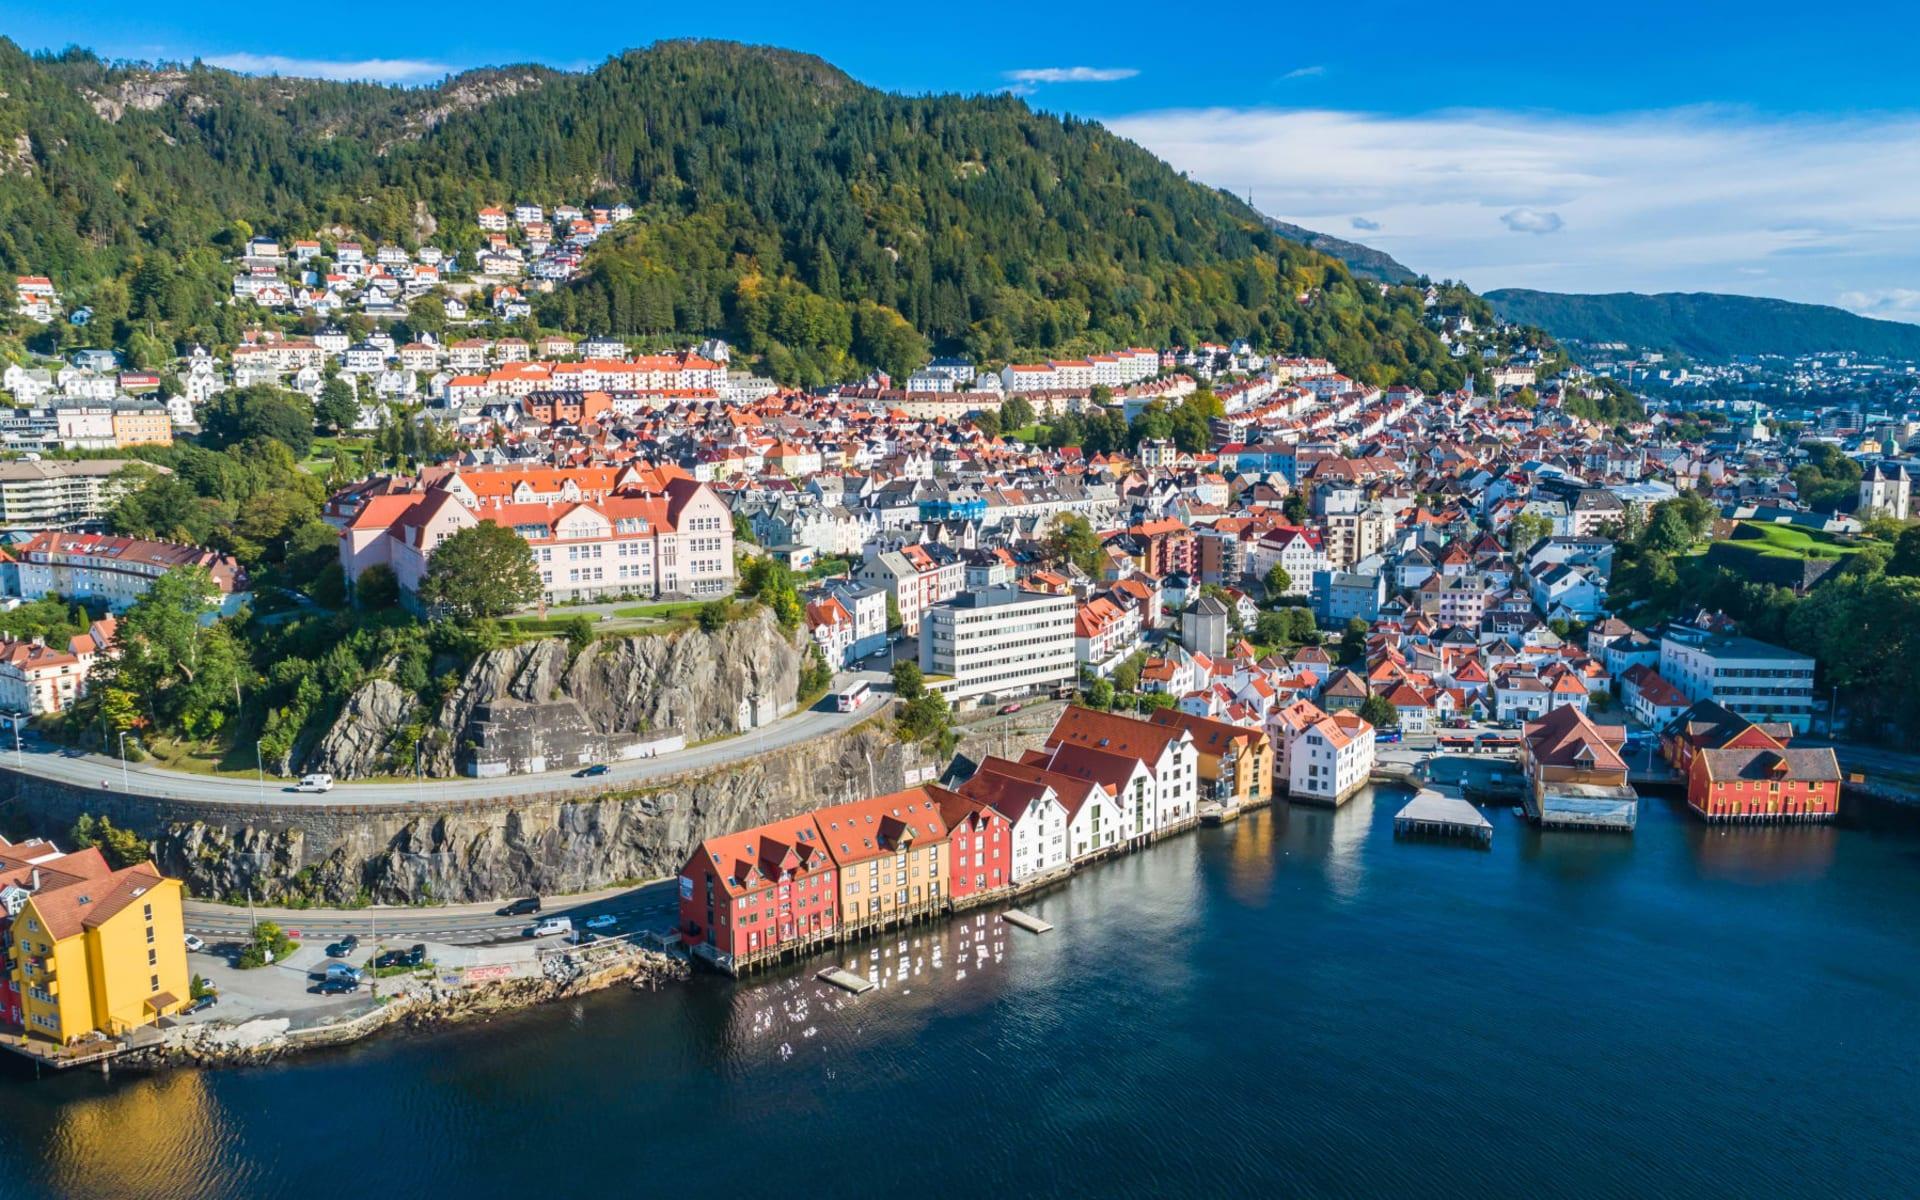 Radisson Blu Royal in Bergen: Bergen Altstadt-Luftbild